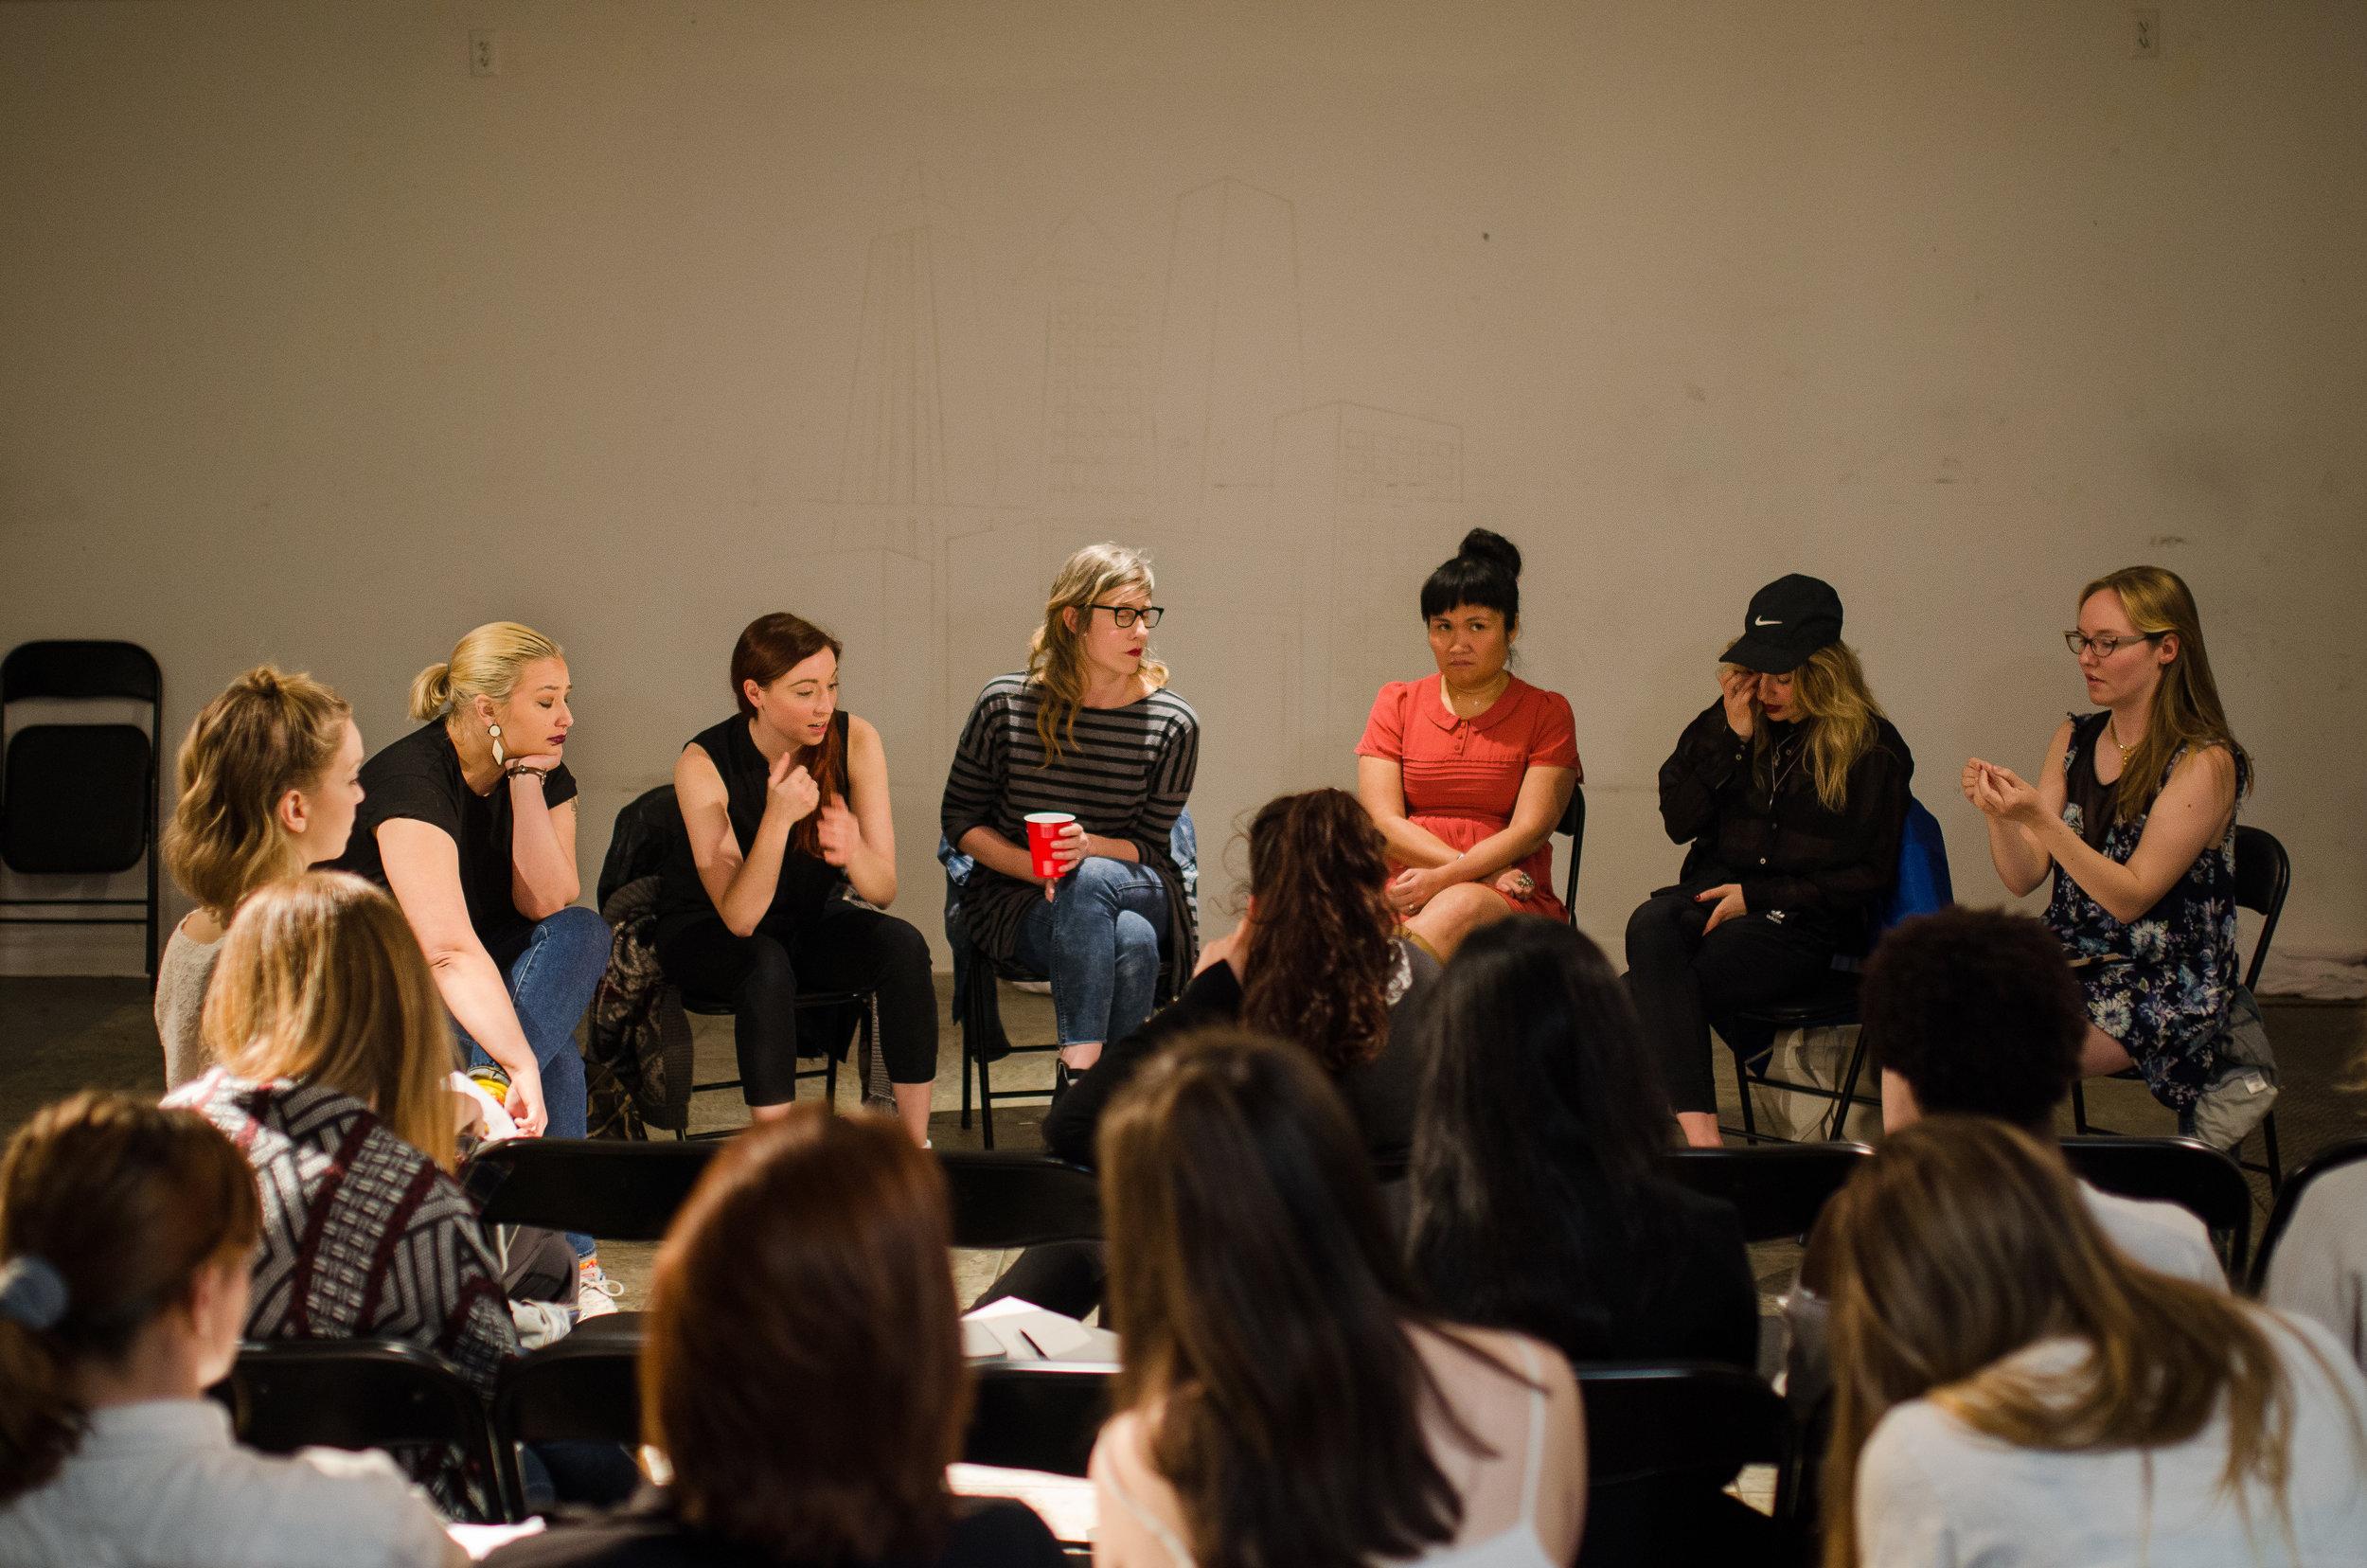 Toronto professionals come in to talk to participants. From left to right: Mel Hague, Victoria Urquhart, Andrea Donaldson, Nina Lee Aquino, Karen Knox and Facilitaror Claren Grosz. (Photo: Samantha Polzin)